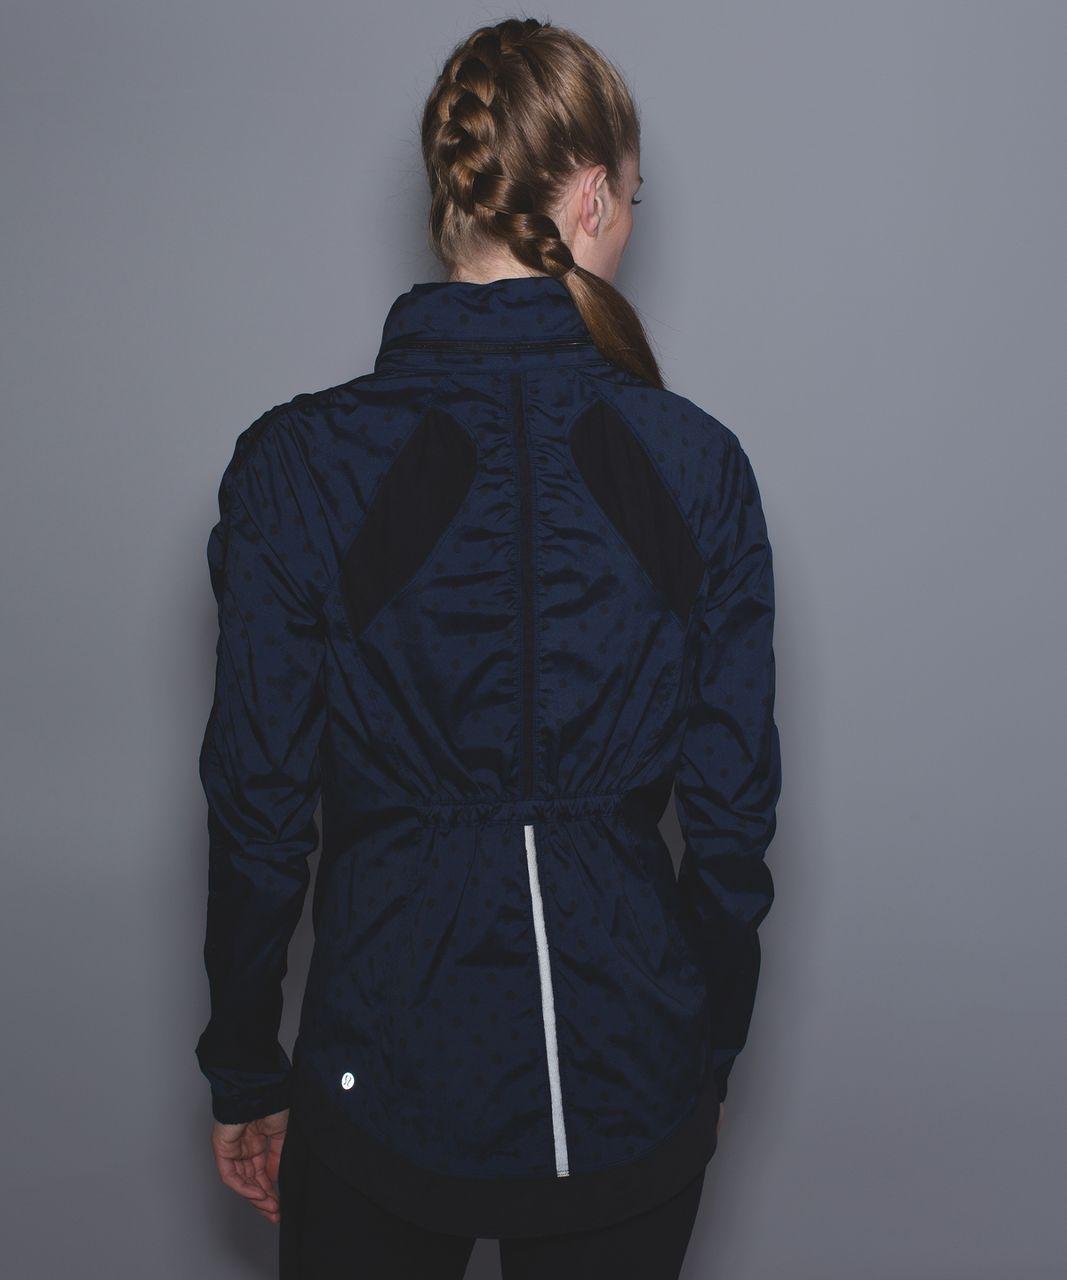 Lululemon Gather And Sprint Jacket - Ghost Dot Deep Navy Black / Black